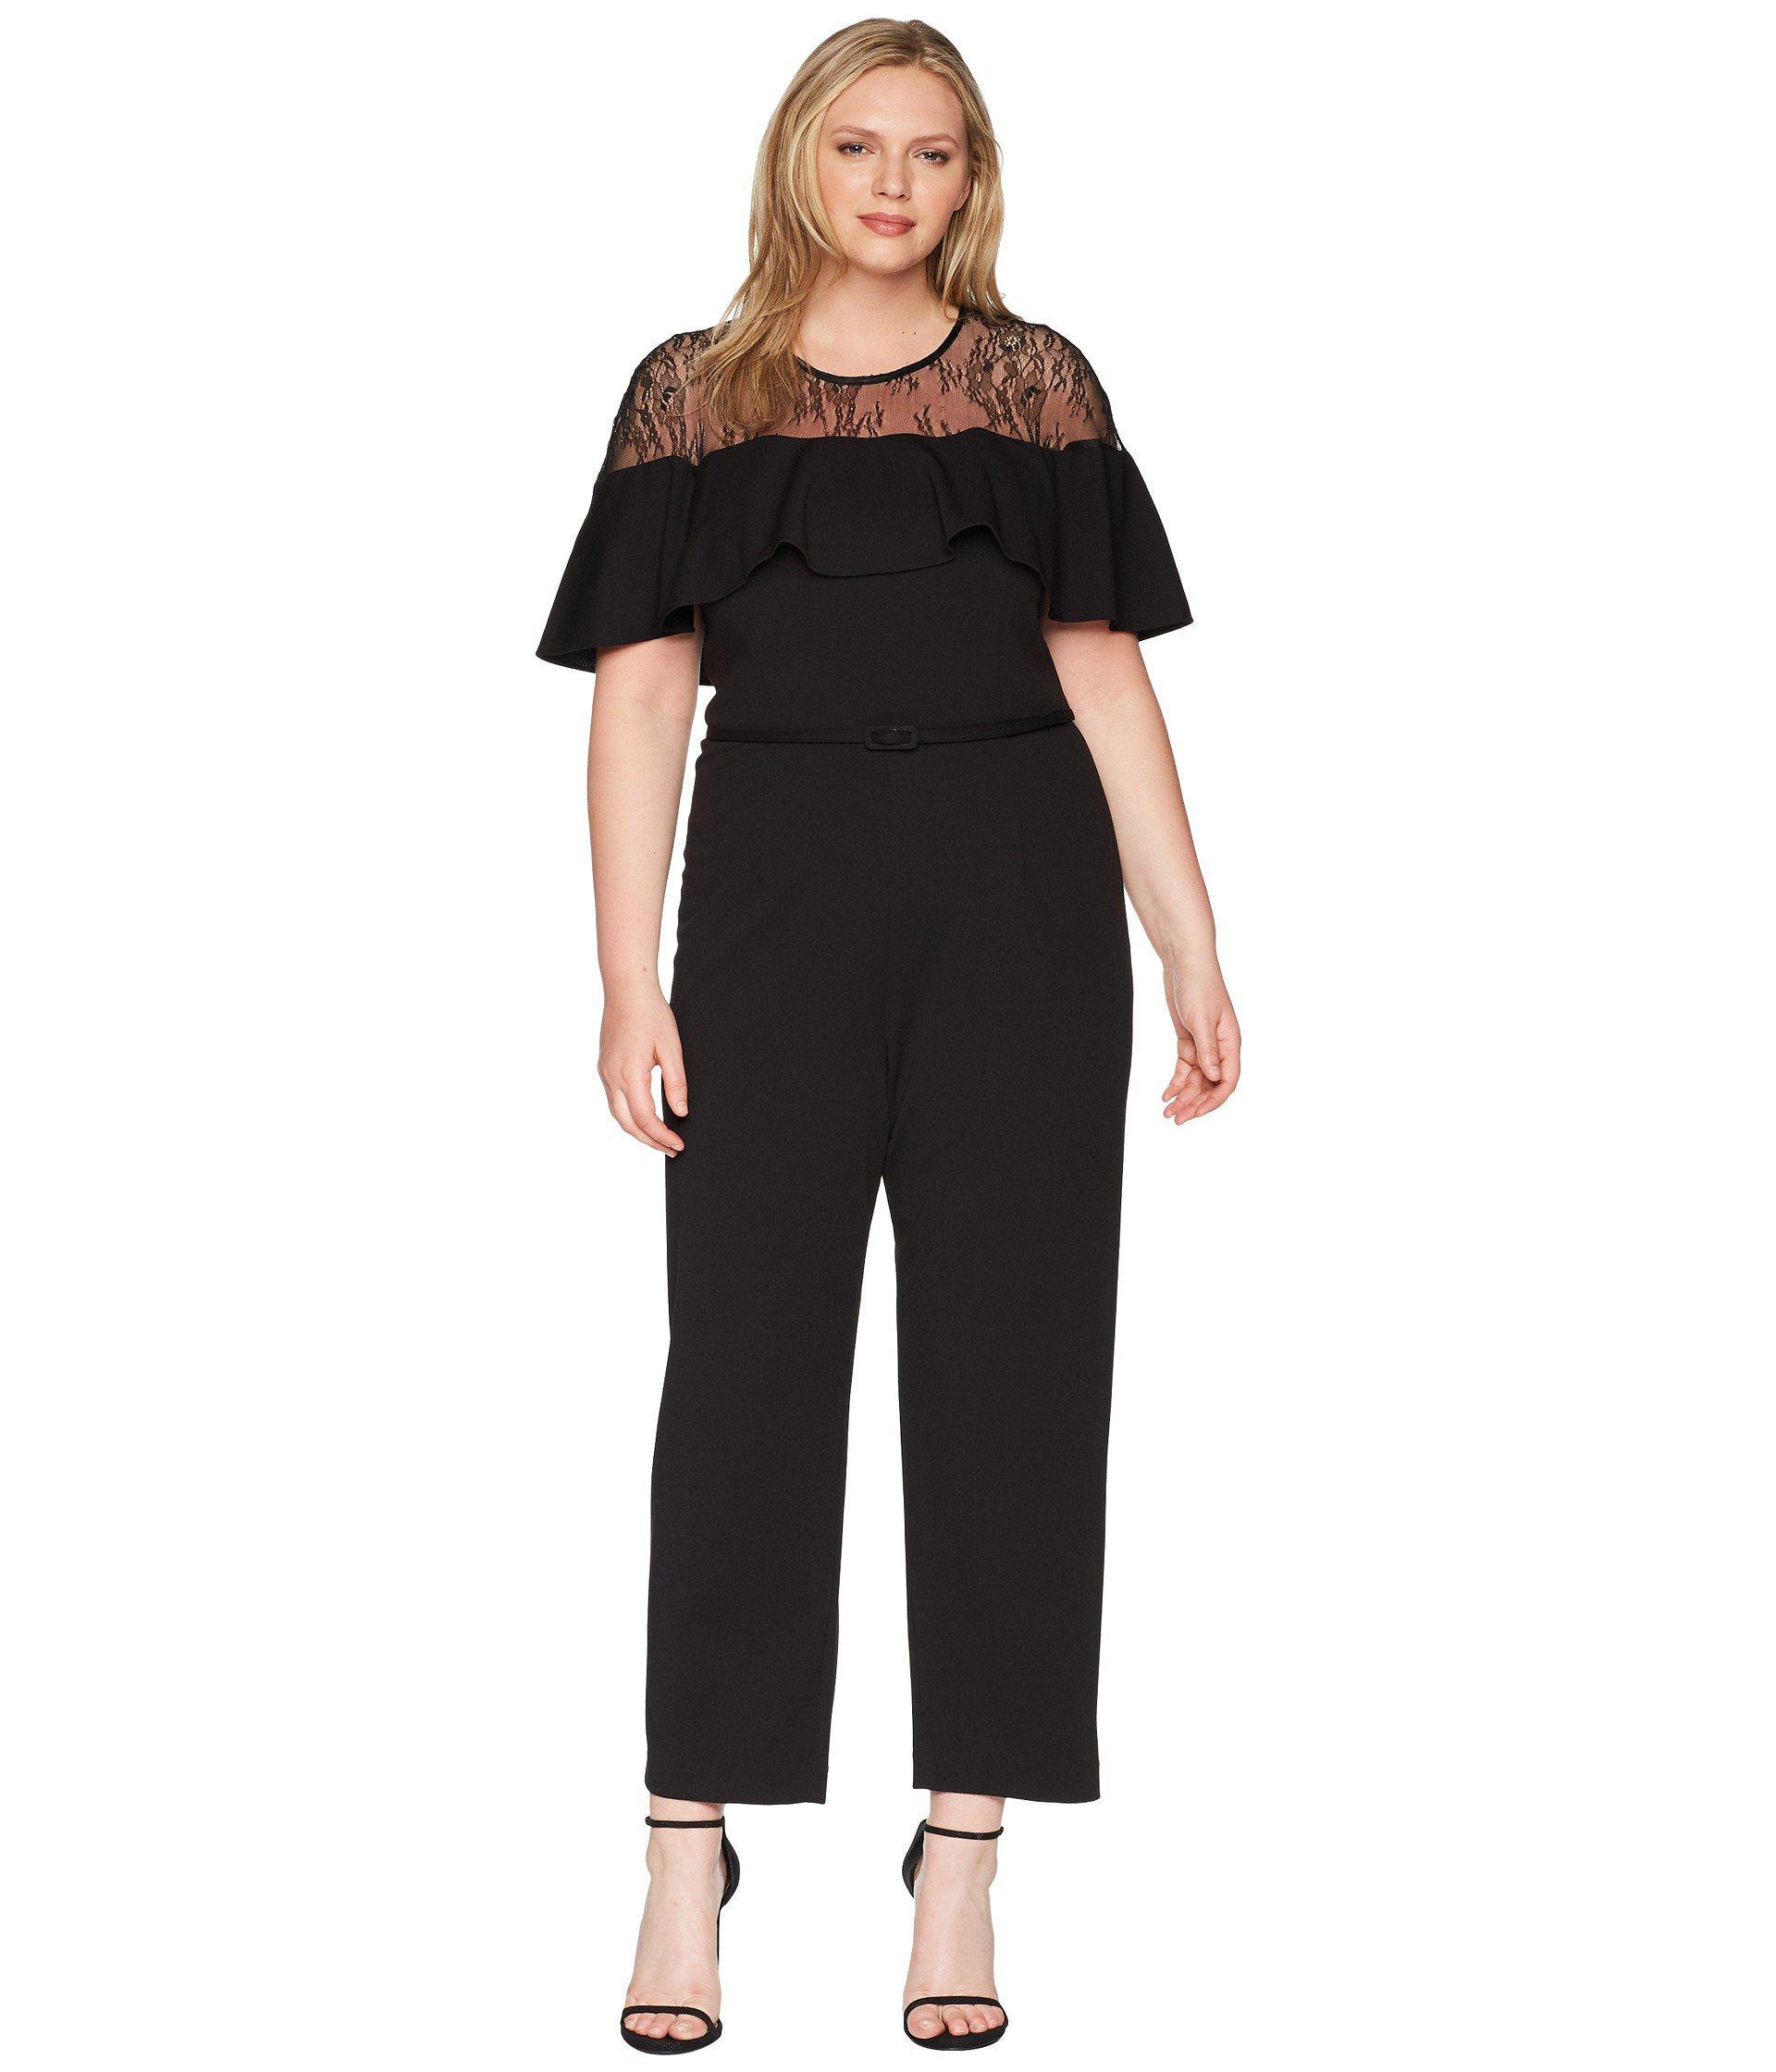 2c5813859622 Lyst - Adrianna Papell Plus Size Illusion Neckline Jumpsuit in Black ...